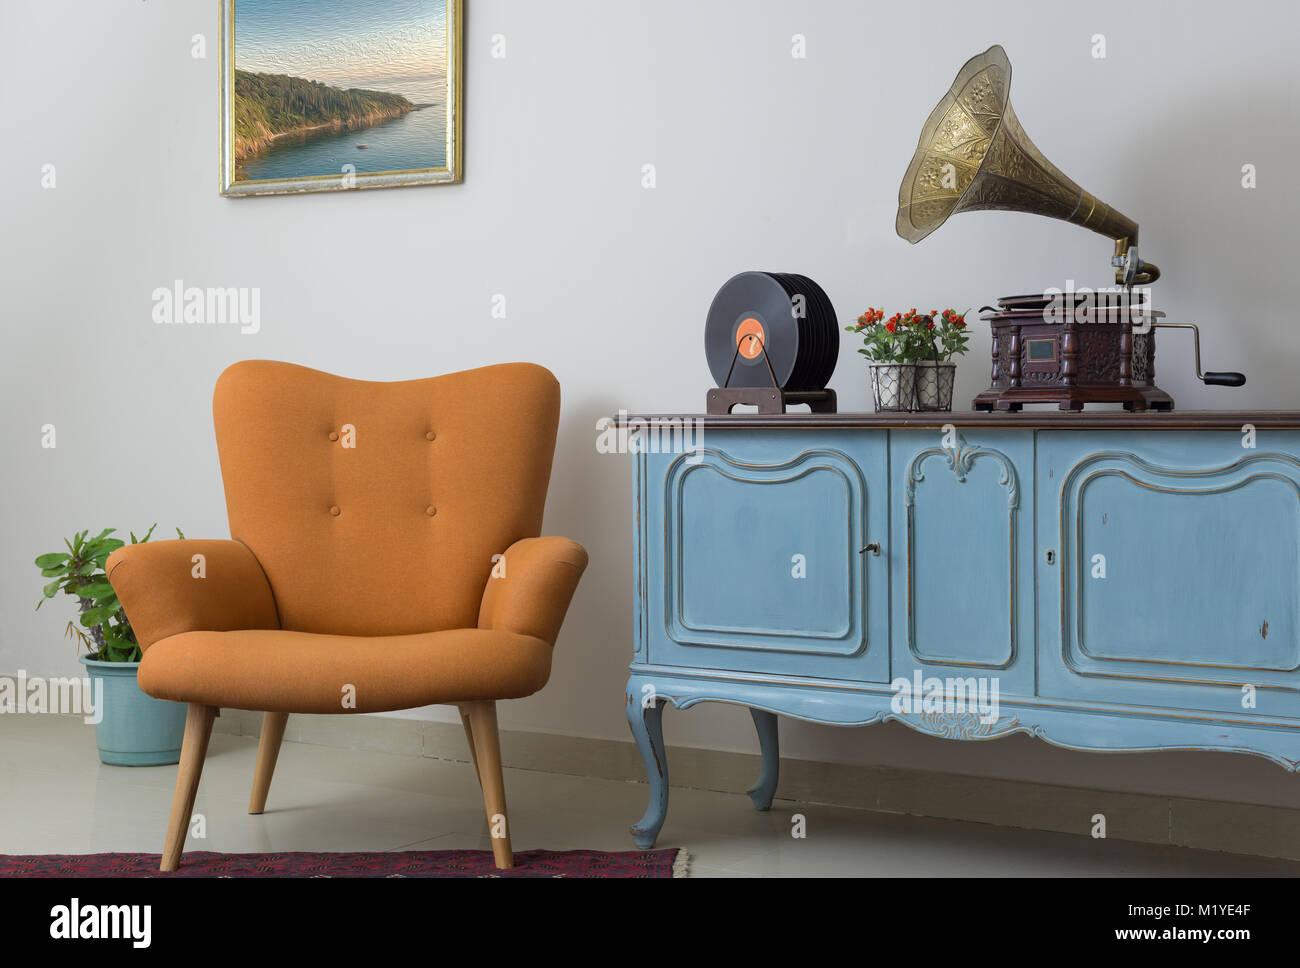 Interior of retro orange armchair, vintage wooden light blue sideboard, old phonograph (gramophone), vinyl records - Stock Image